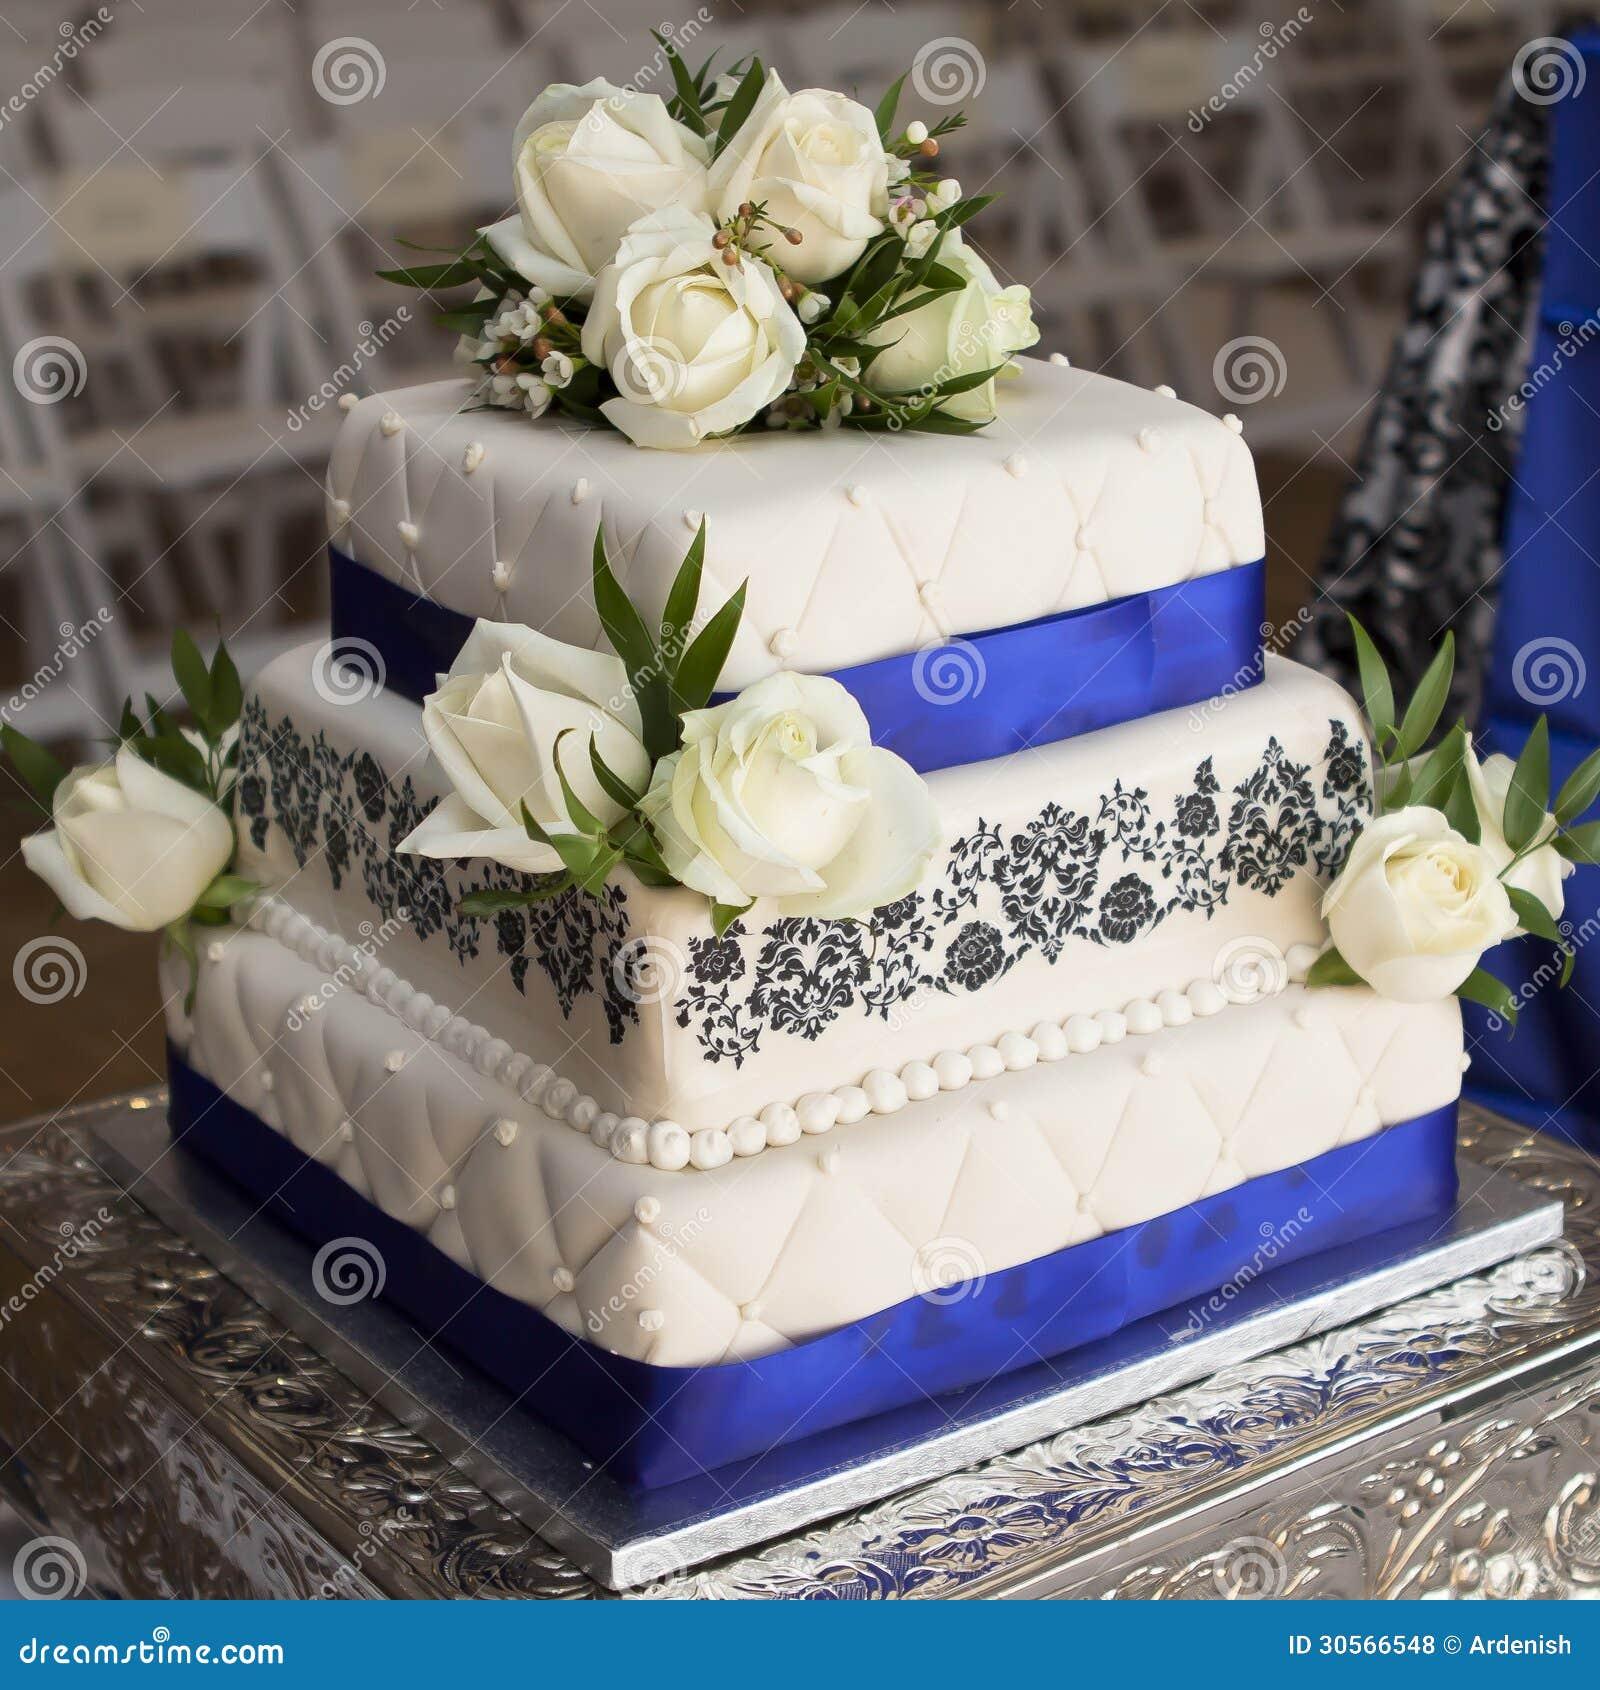 White Rose Wedding Cake Royalty Free Stock s Image